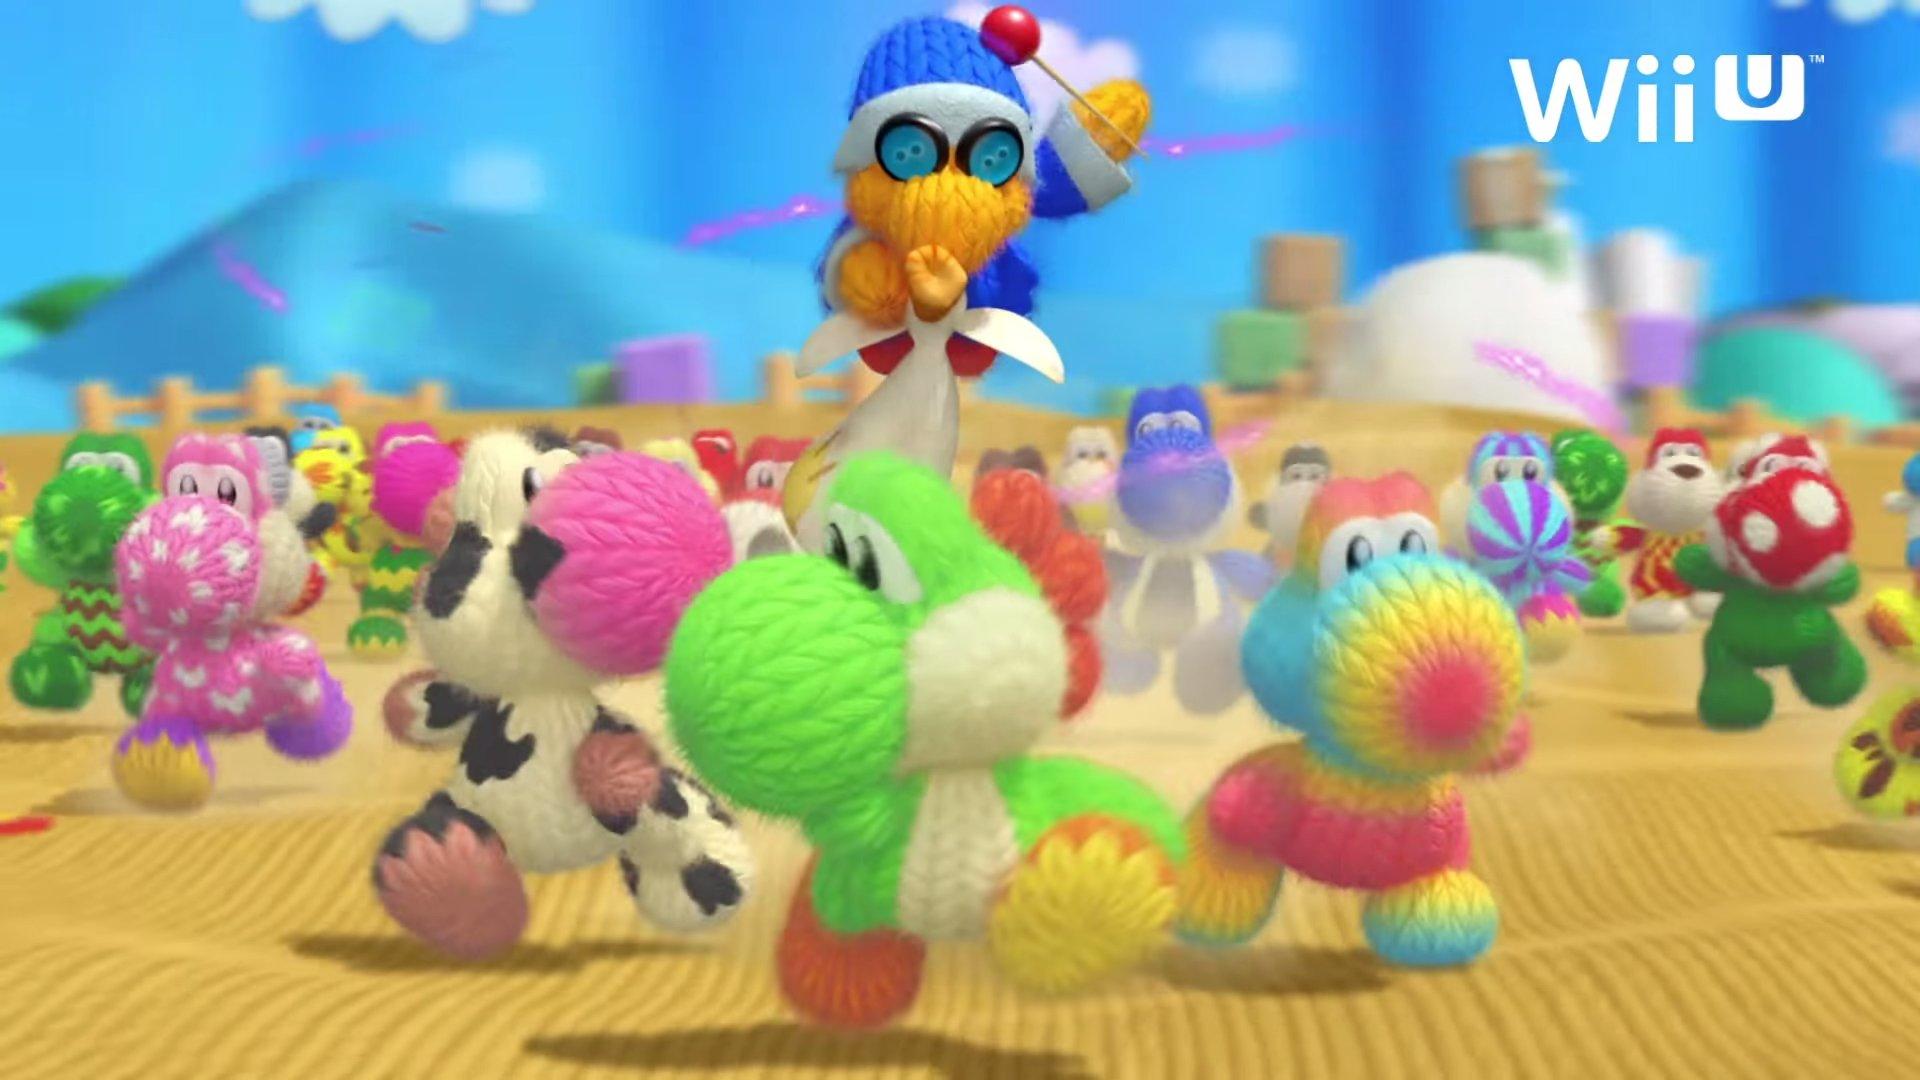 Wii U ヨッシー ウールワールド Tvcm2本が公開 ゲーム情報